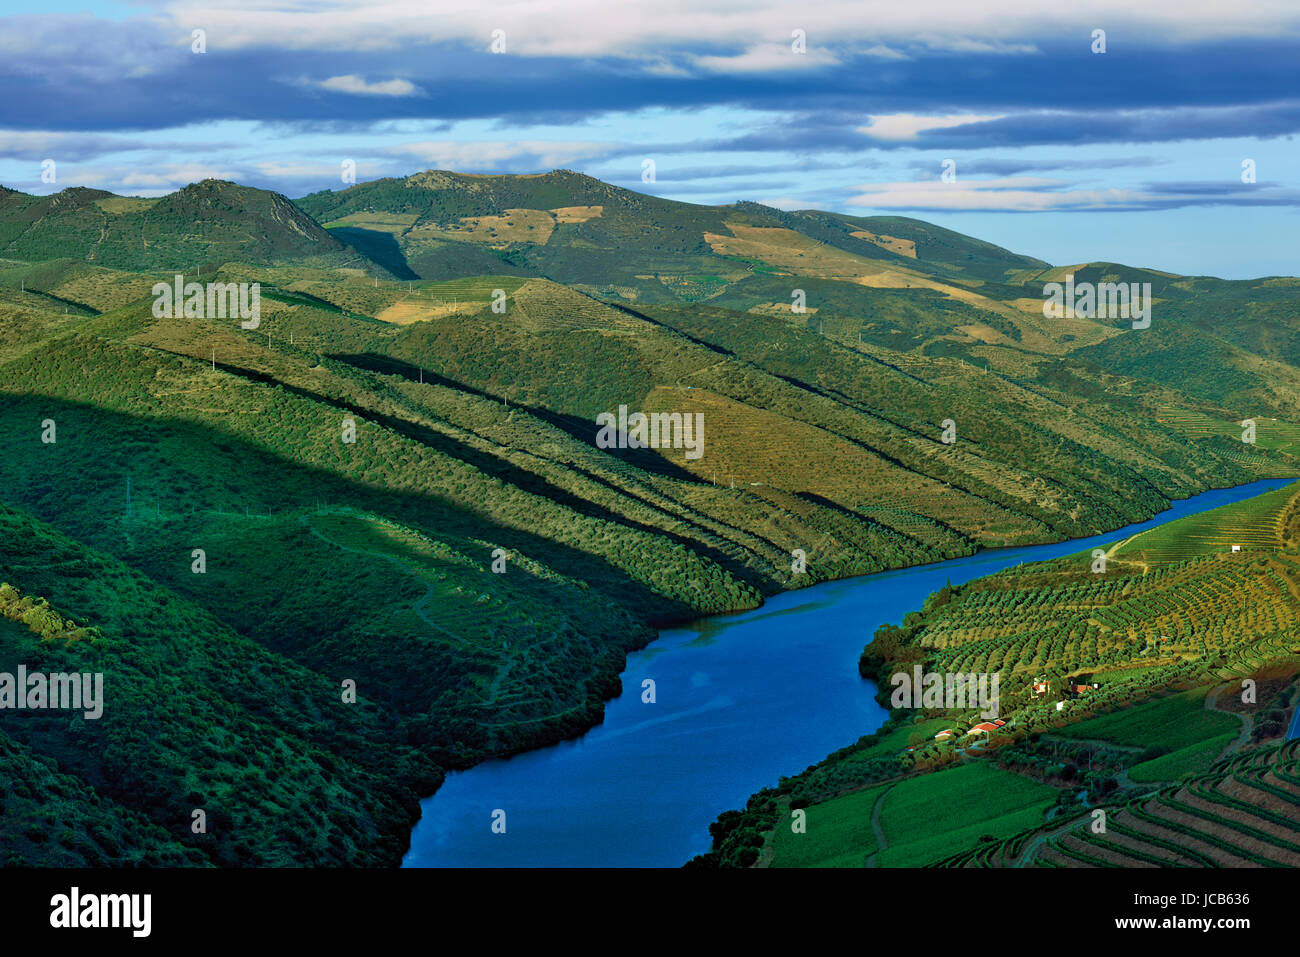 River Douro view - Stock Image